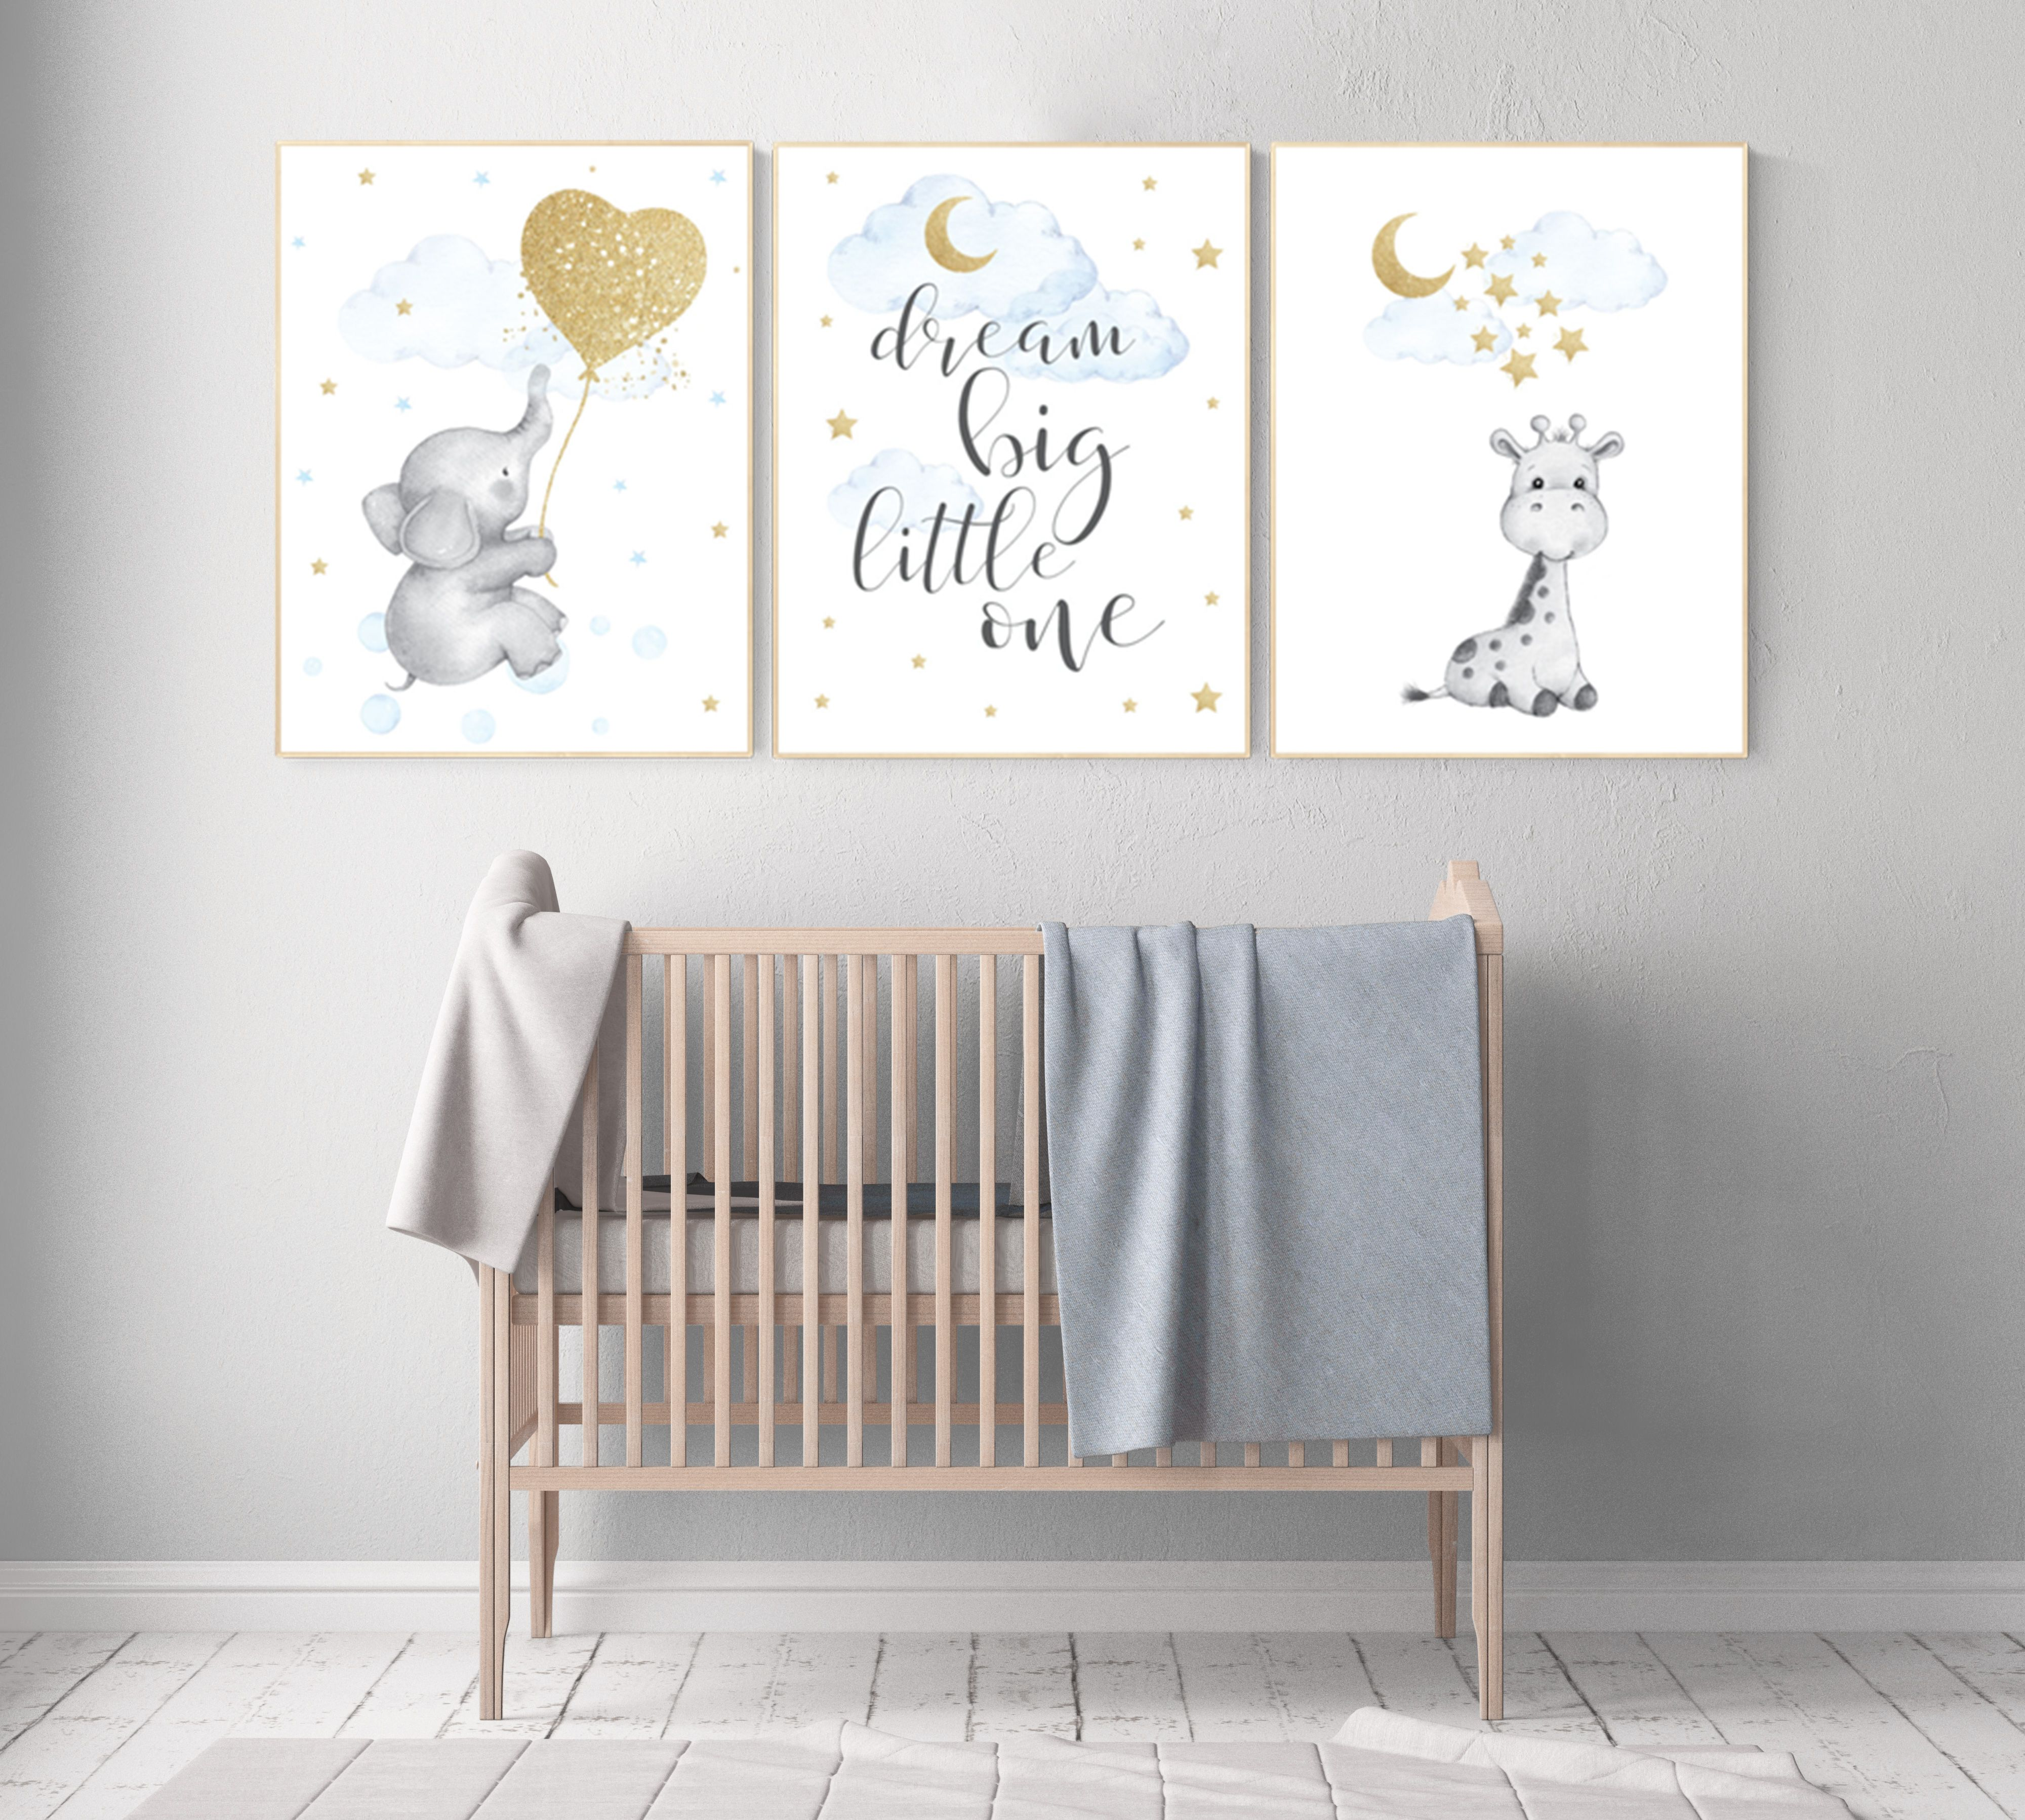 Twinkle Twinkle Little Star Print Nursery Print Navy Blue Nursery Printable Art Hand Lettered Print Kids Room Decor Baby Wall Art